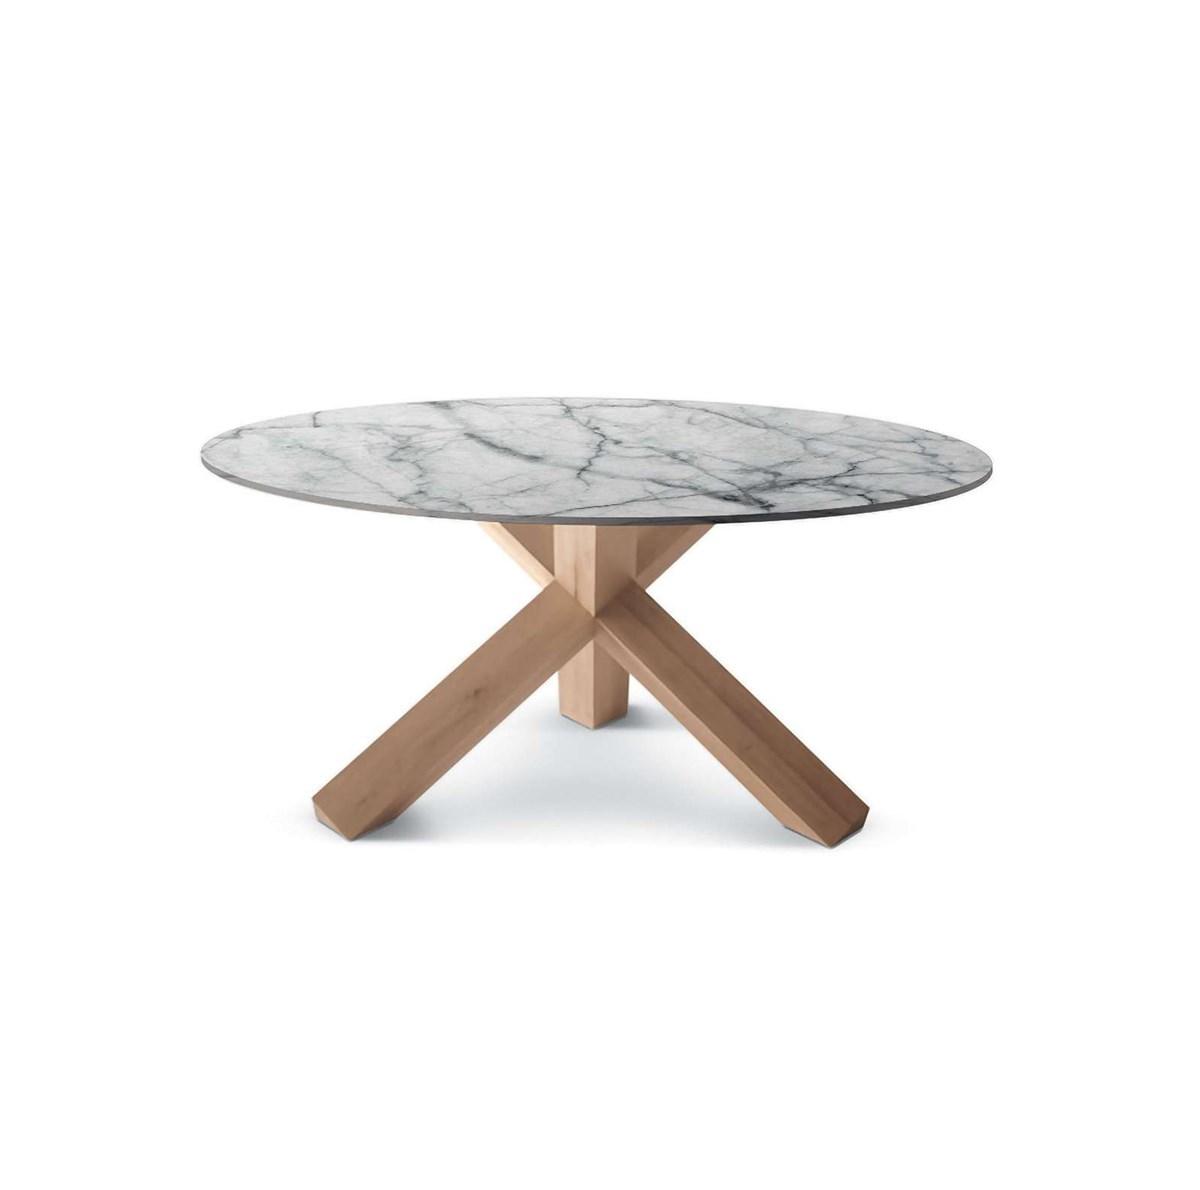 Cassina-Mario-Bellini-La-Rotonda-Table-Matisse-1